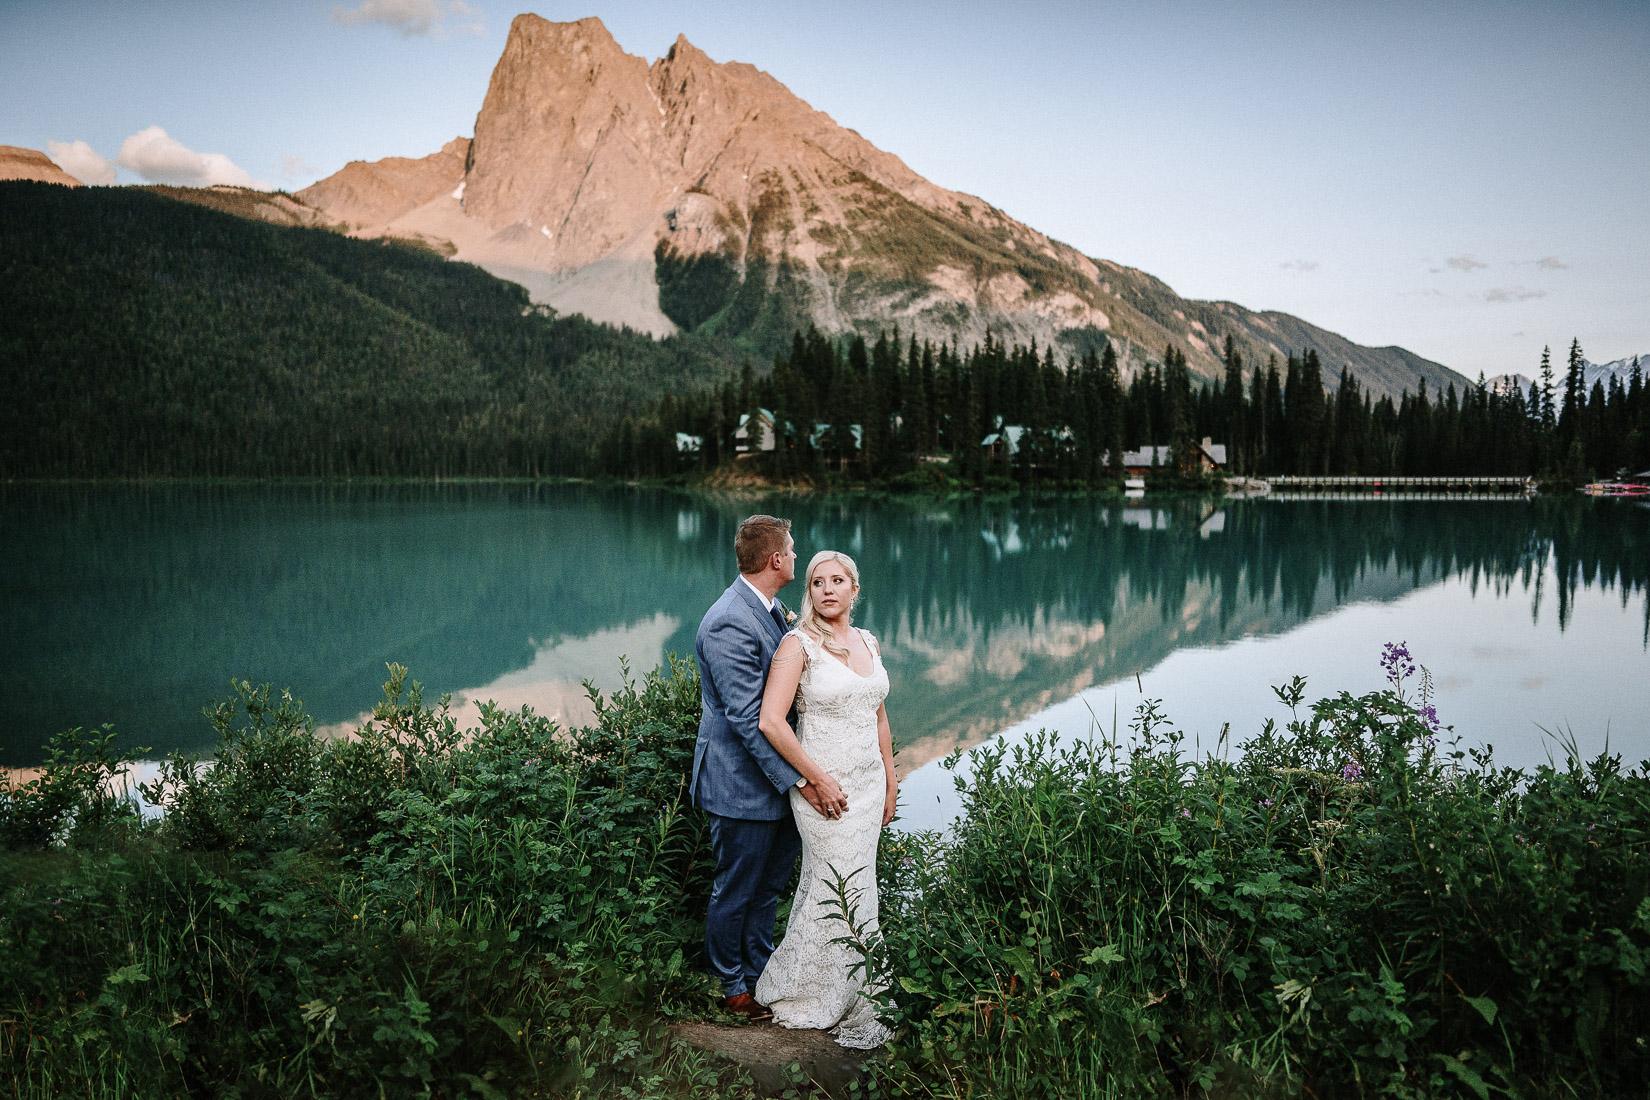 wedding at Emerald lake Lodge sunset